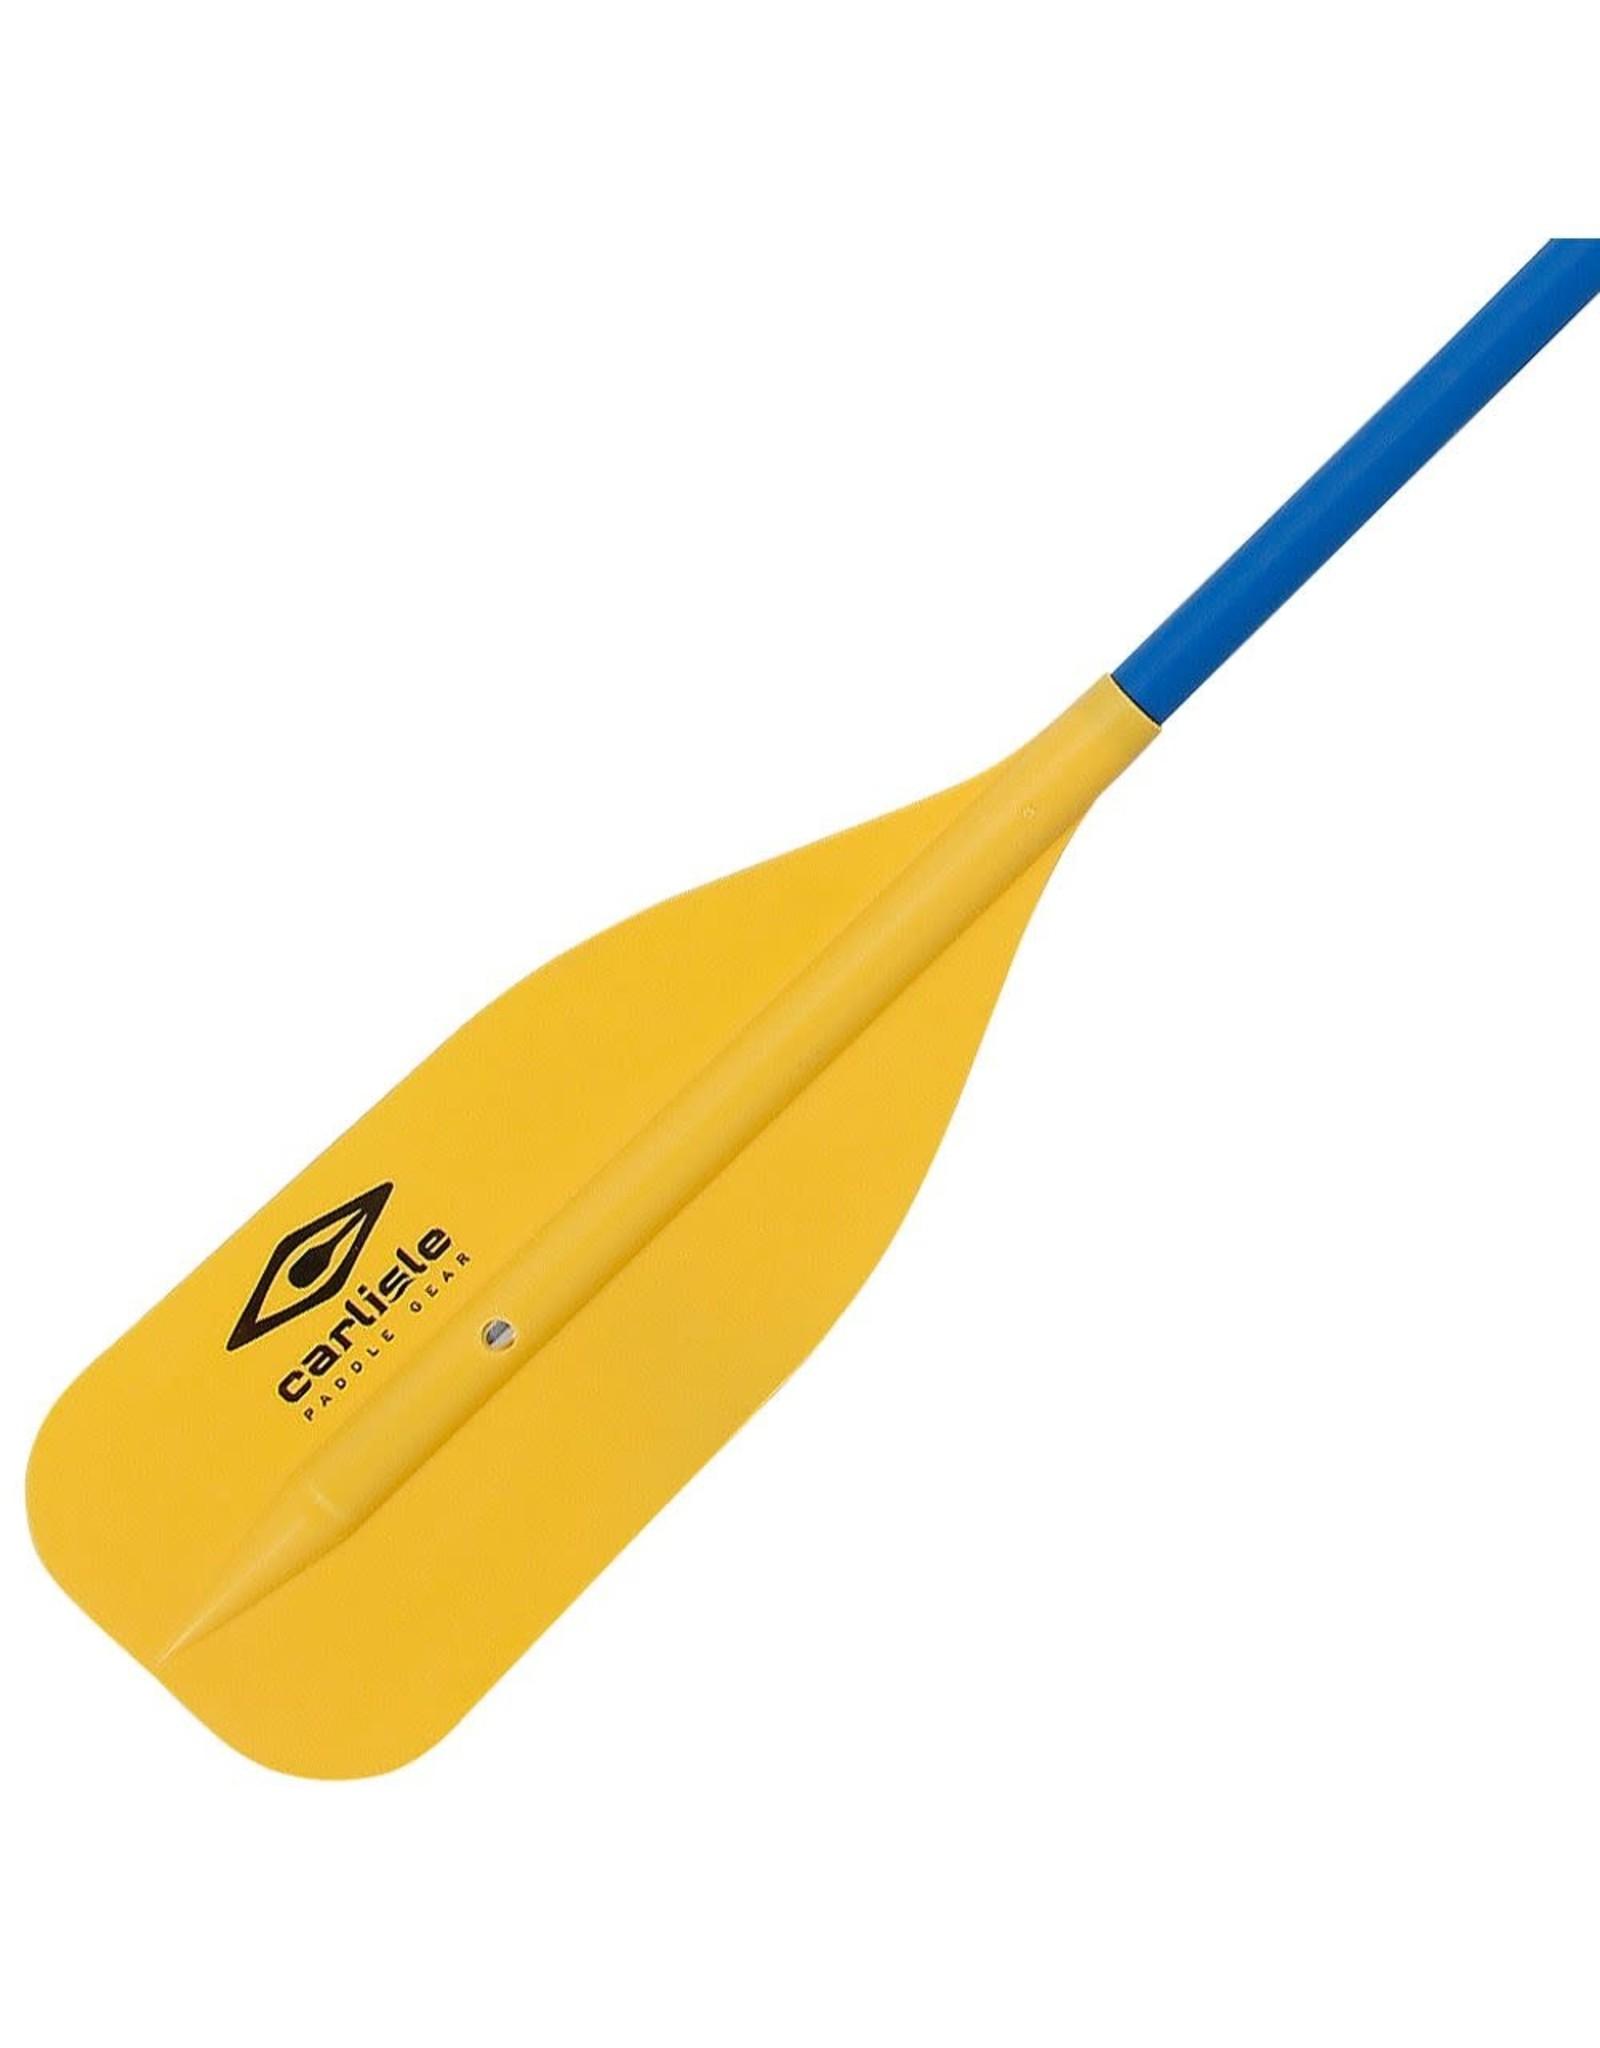 Carlisle Carlisle Standard Paddle